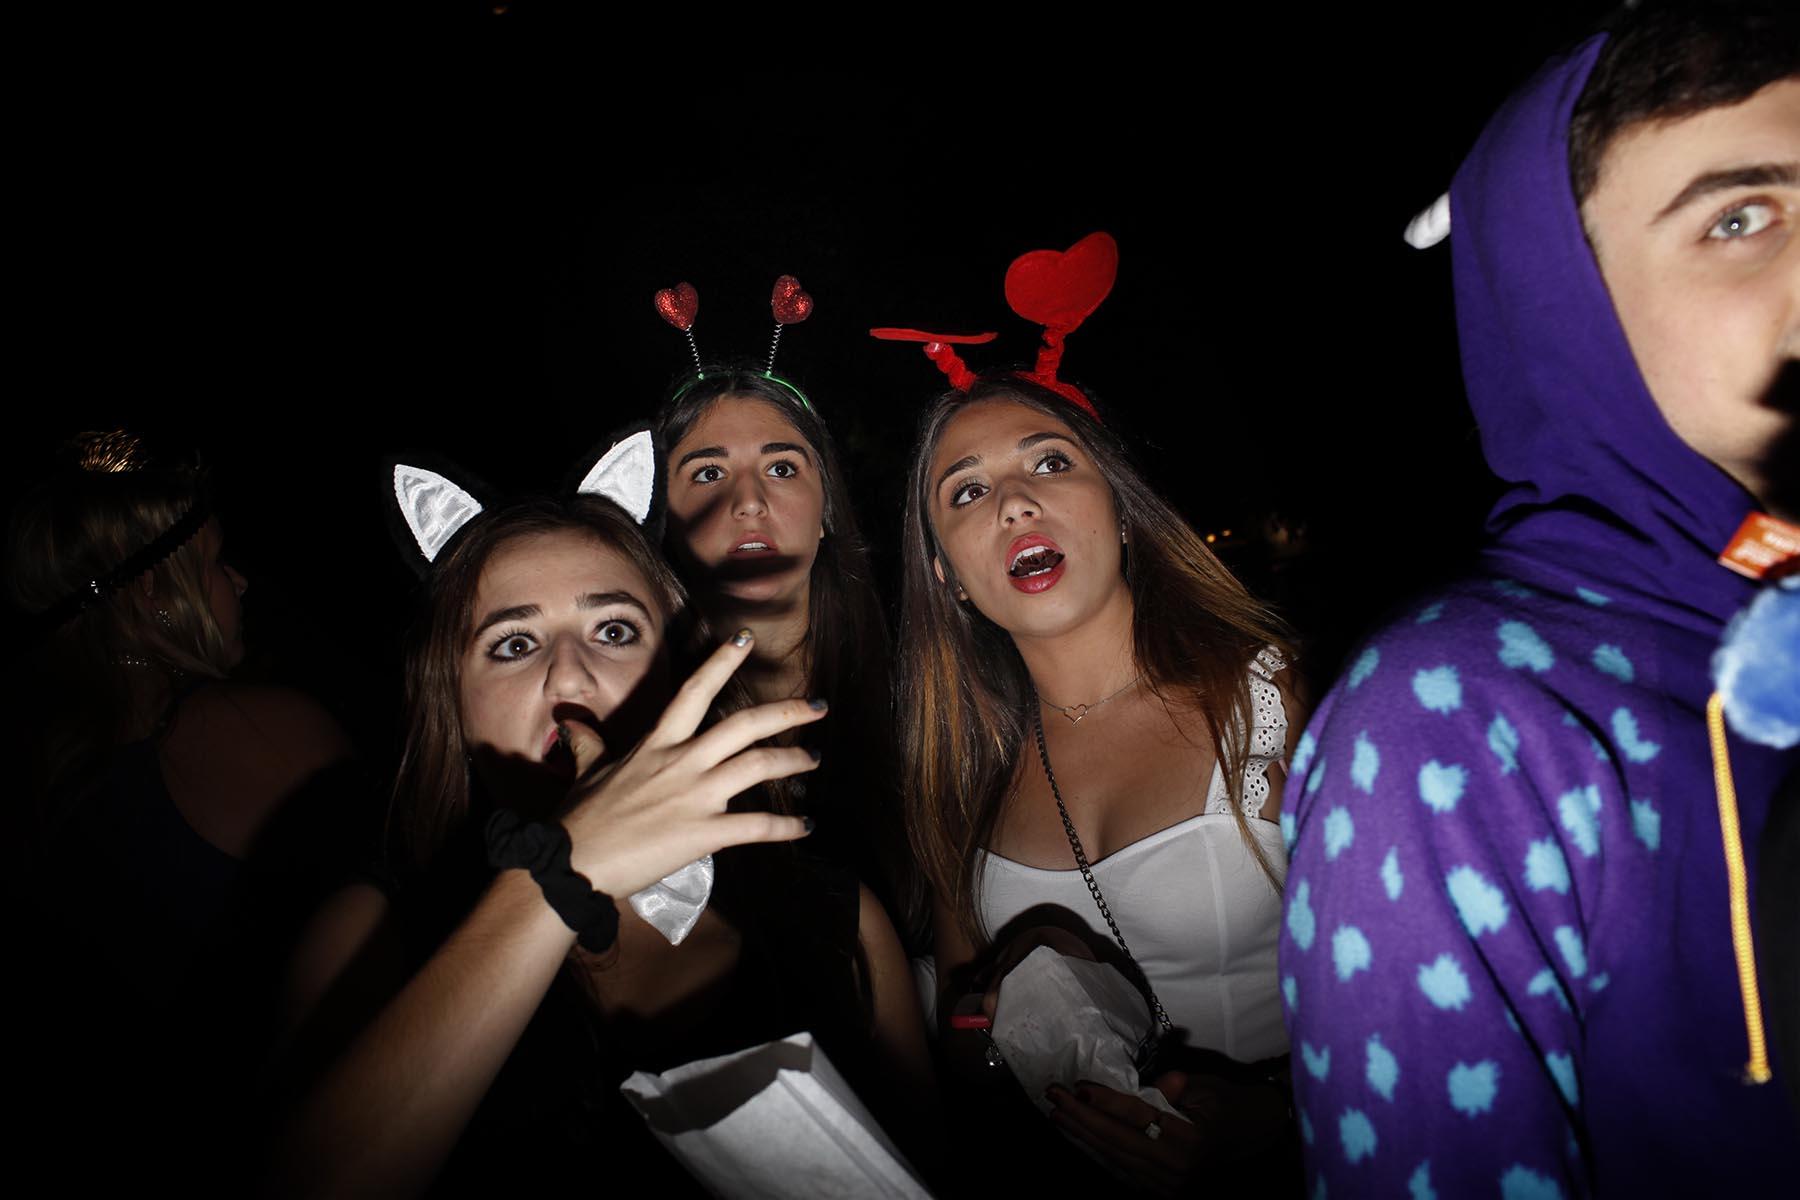 halloween20141031_0010